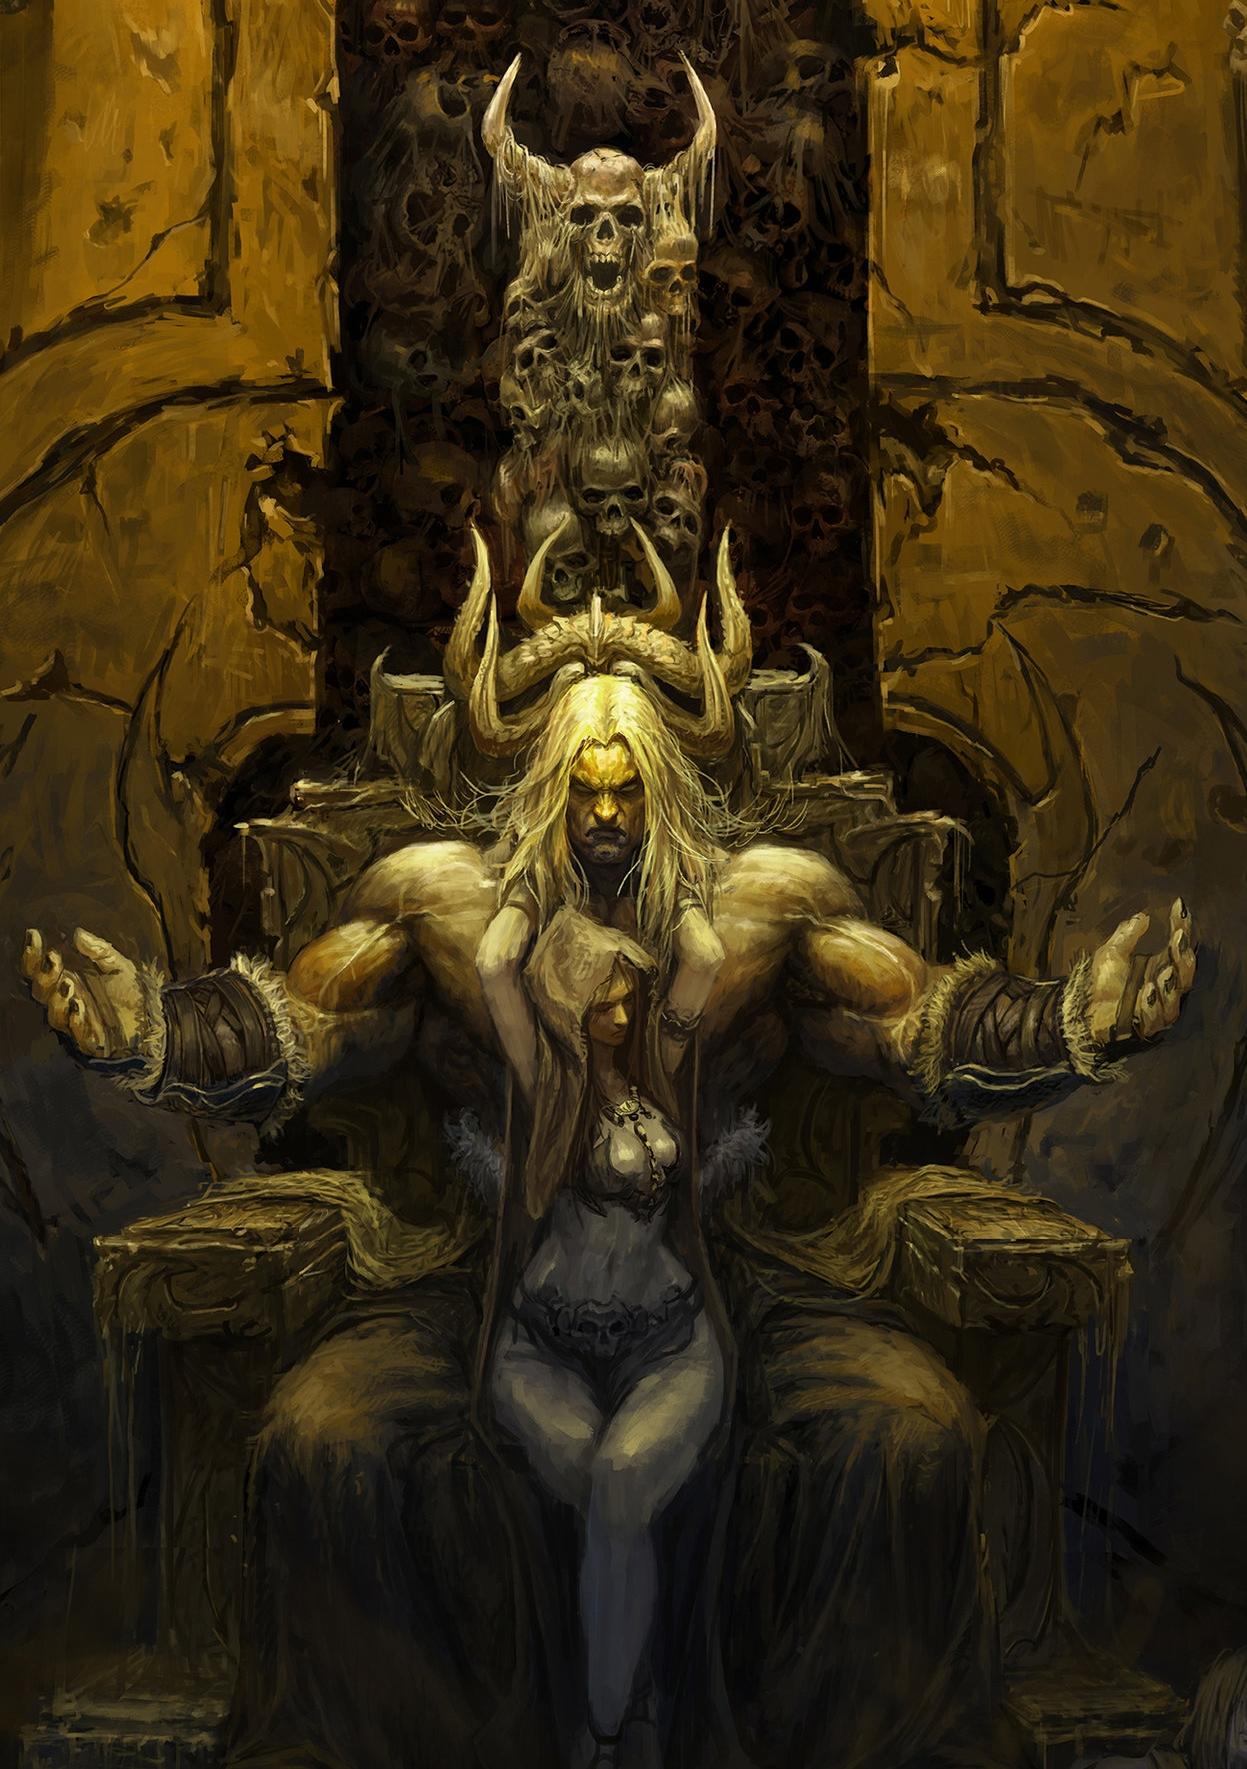 Kral Kaos